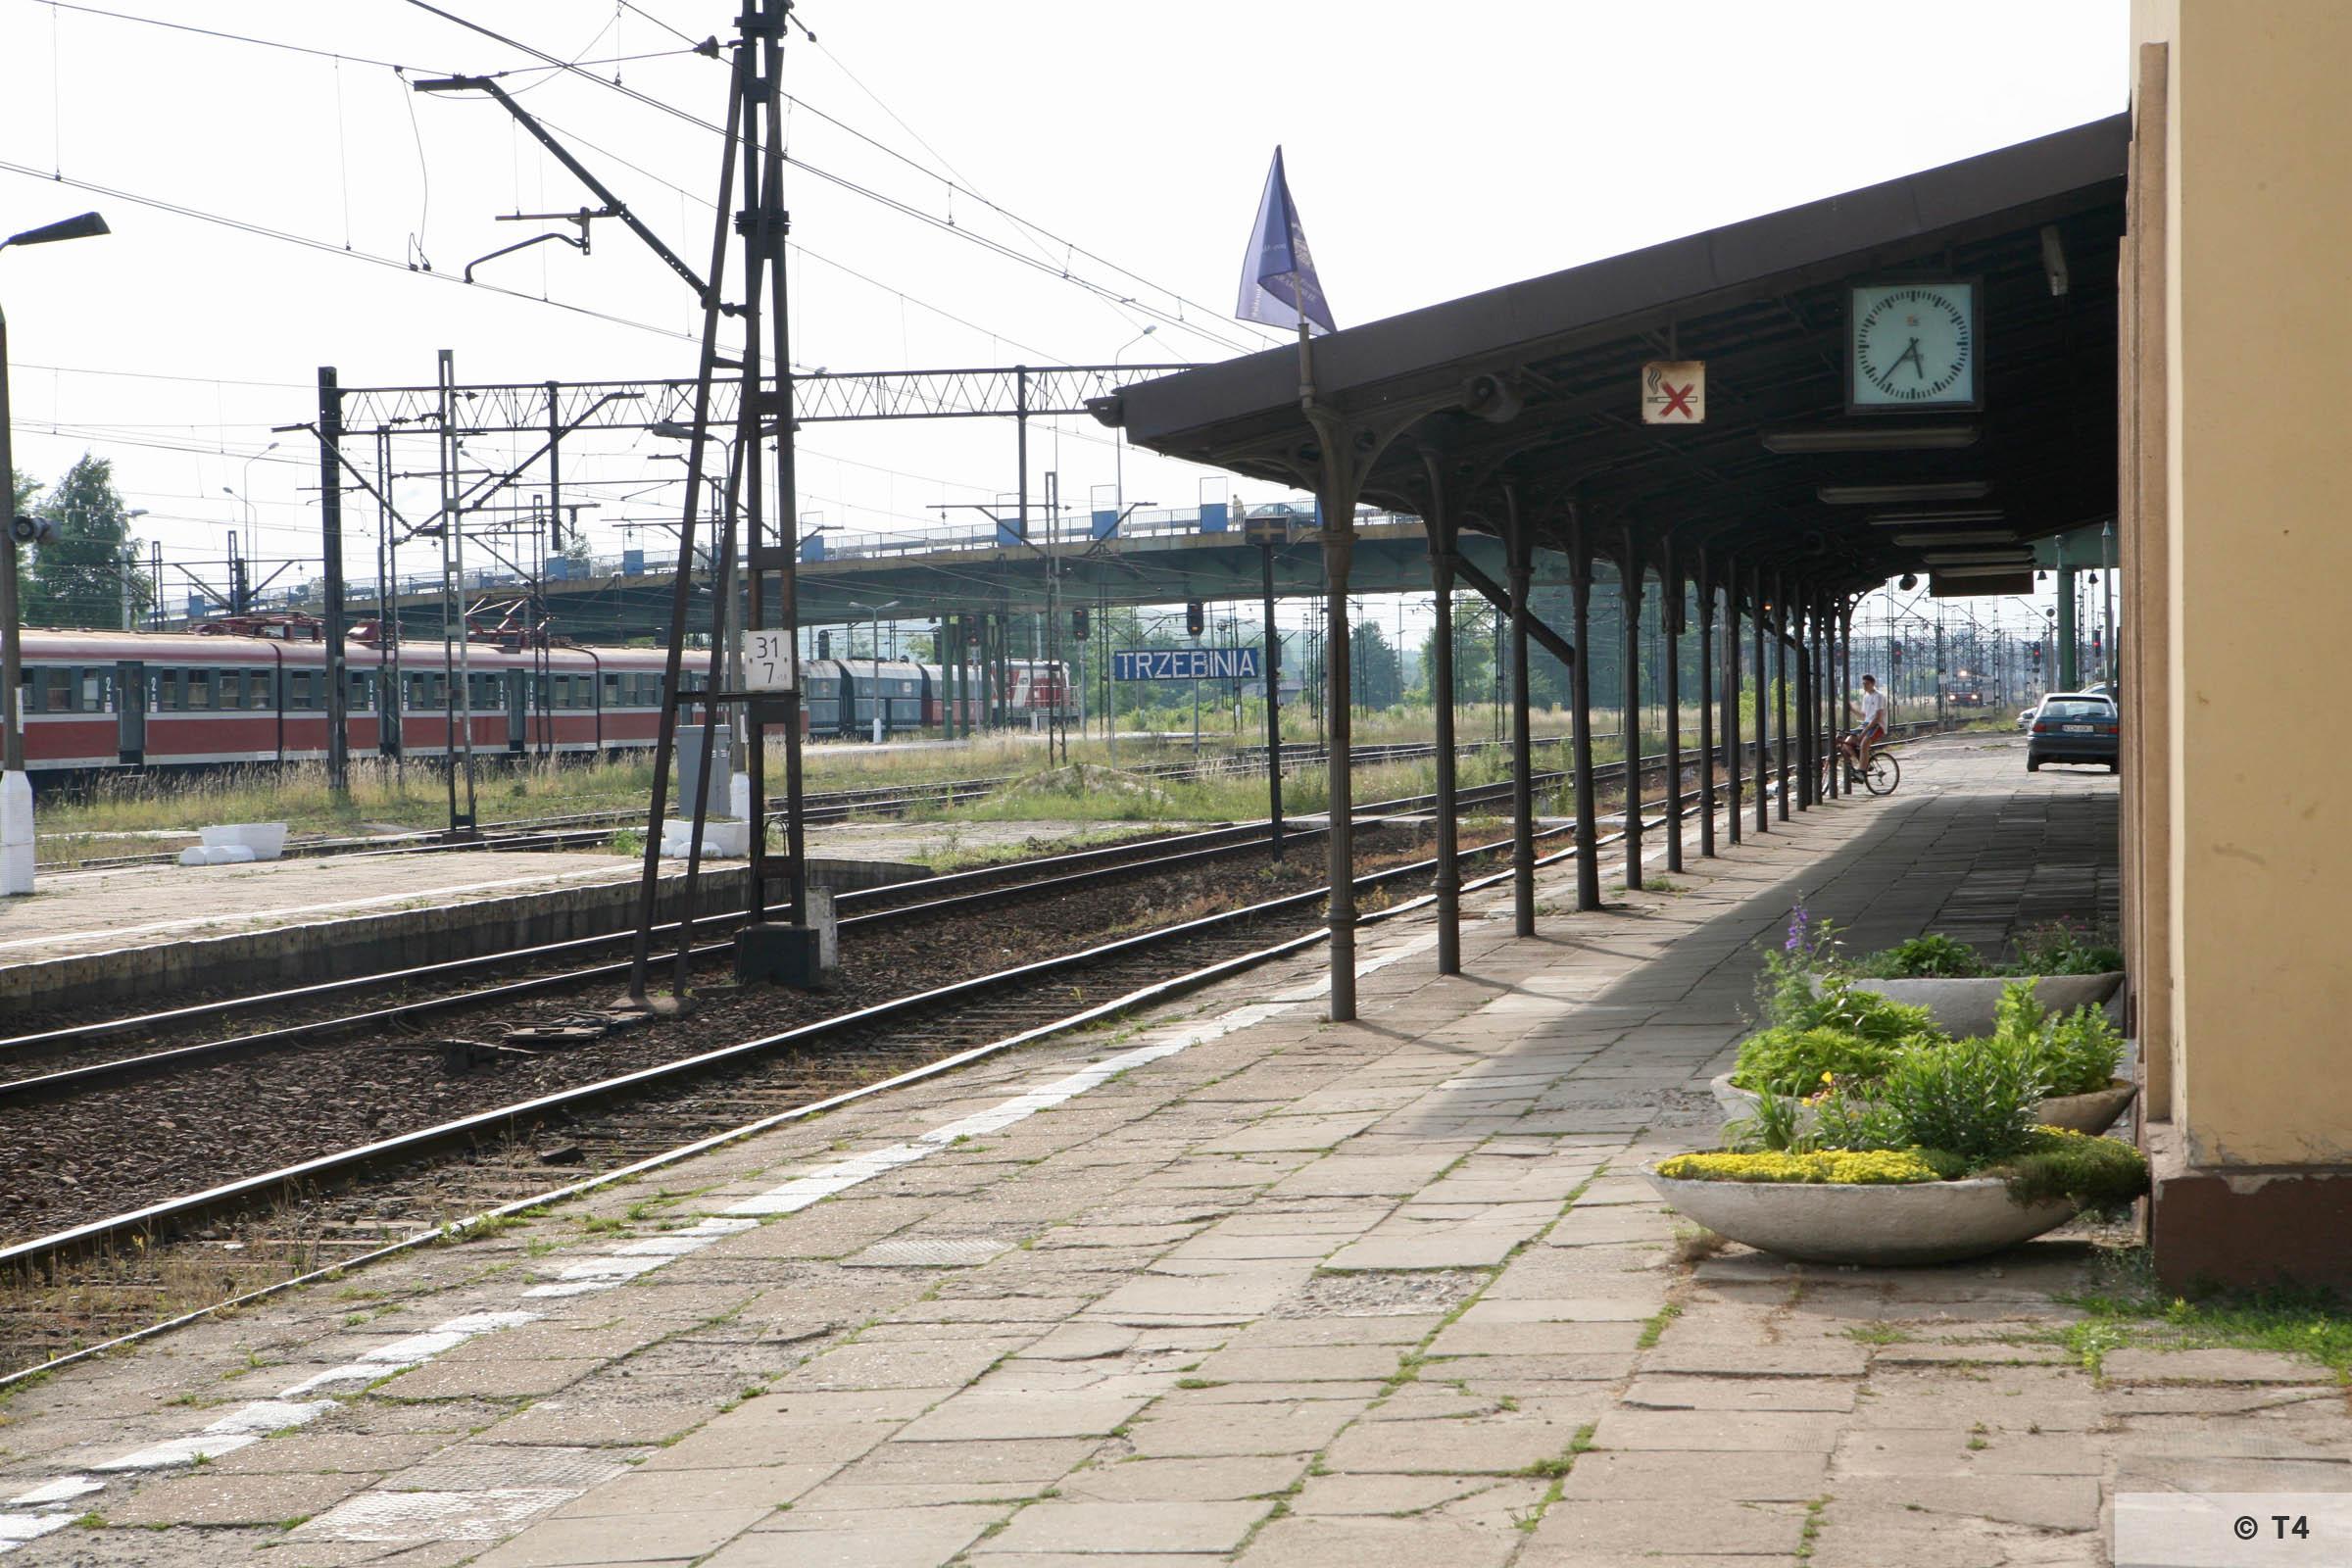 Trzbenina railway station. 2007 T4 4726